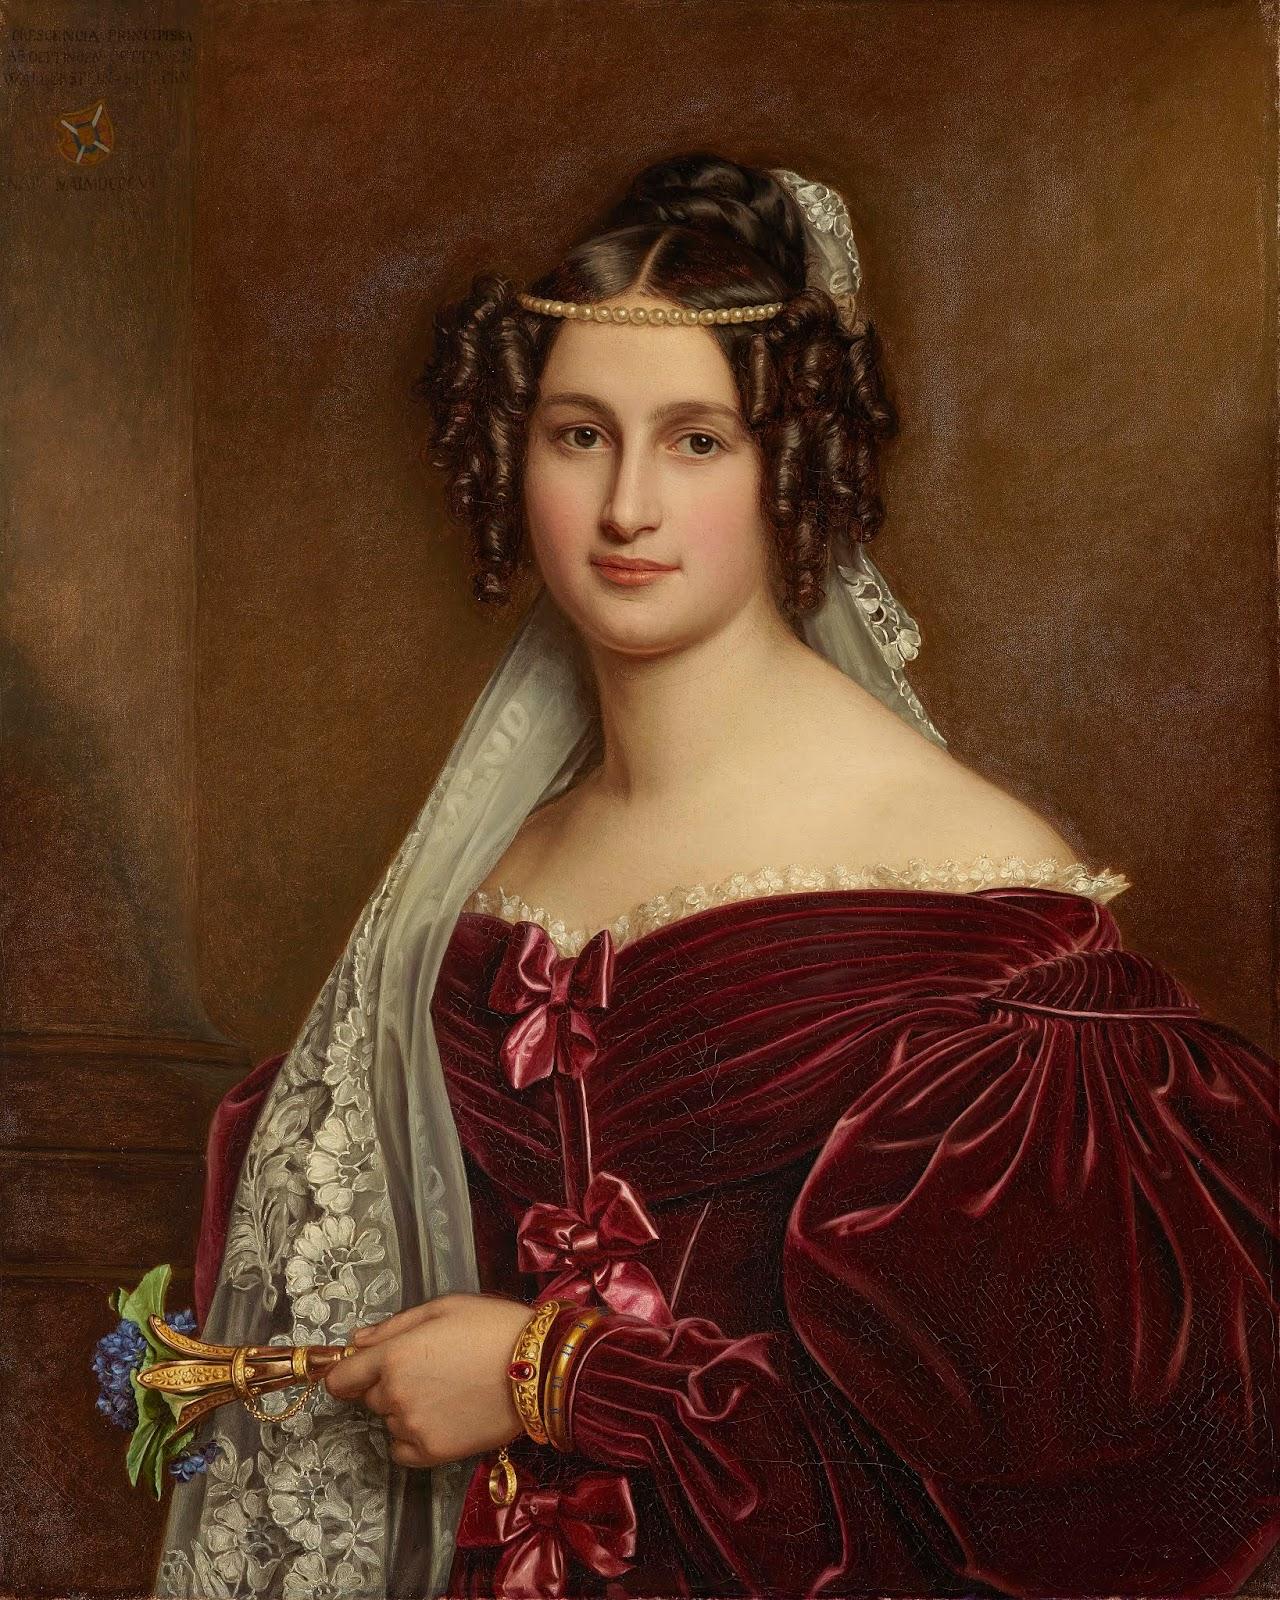 Paintings by Joseph Karl Stieler (1781-1858)